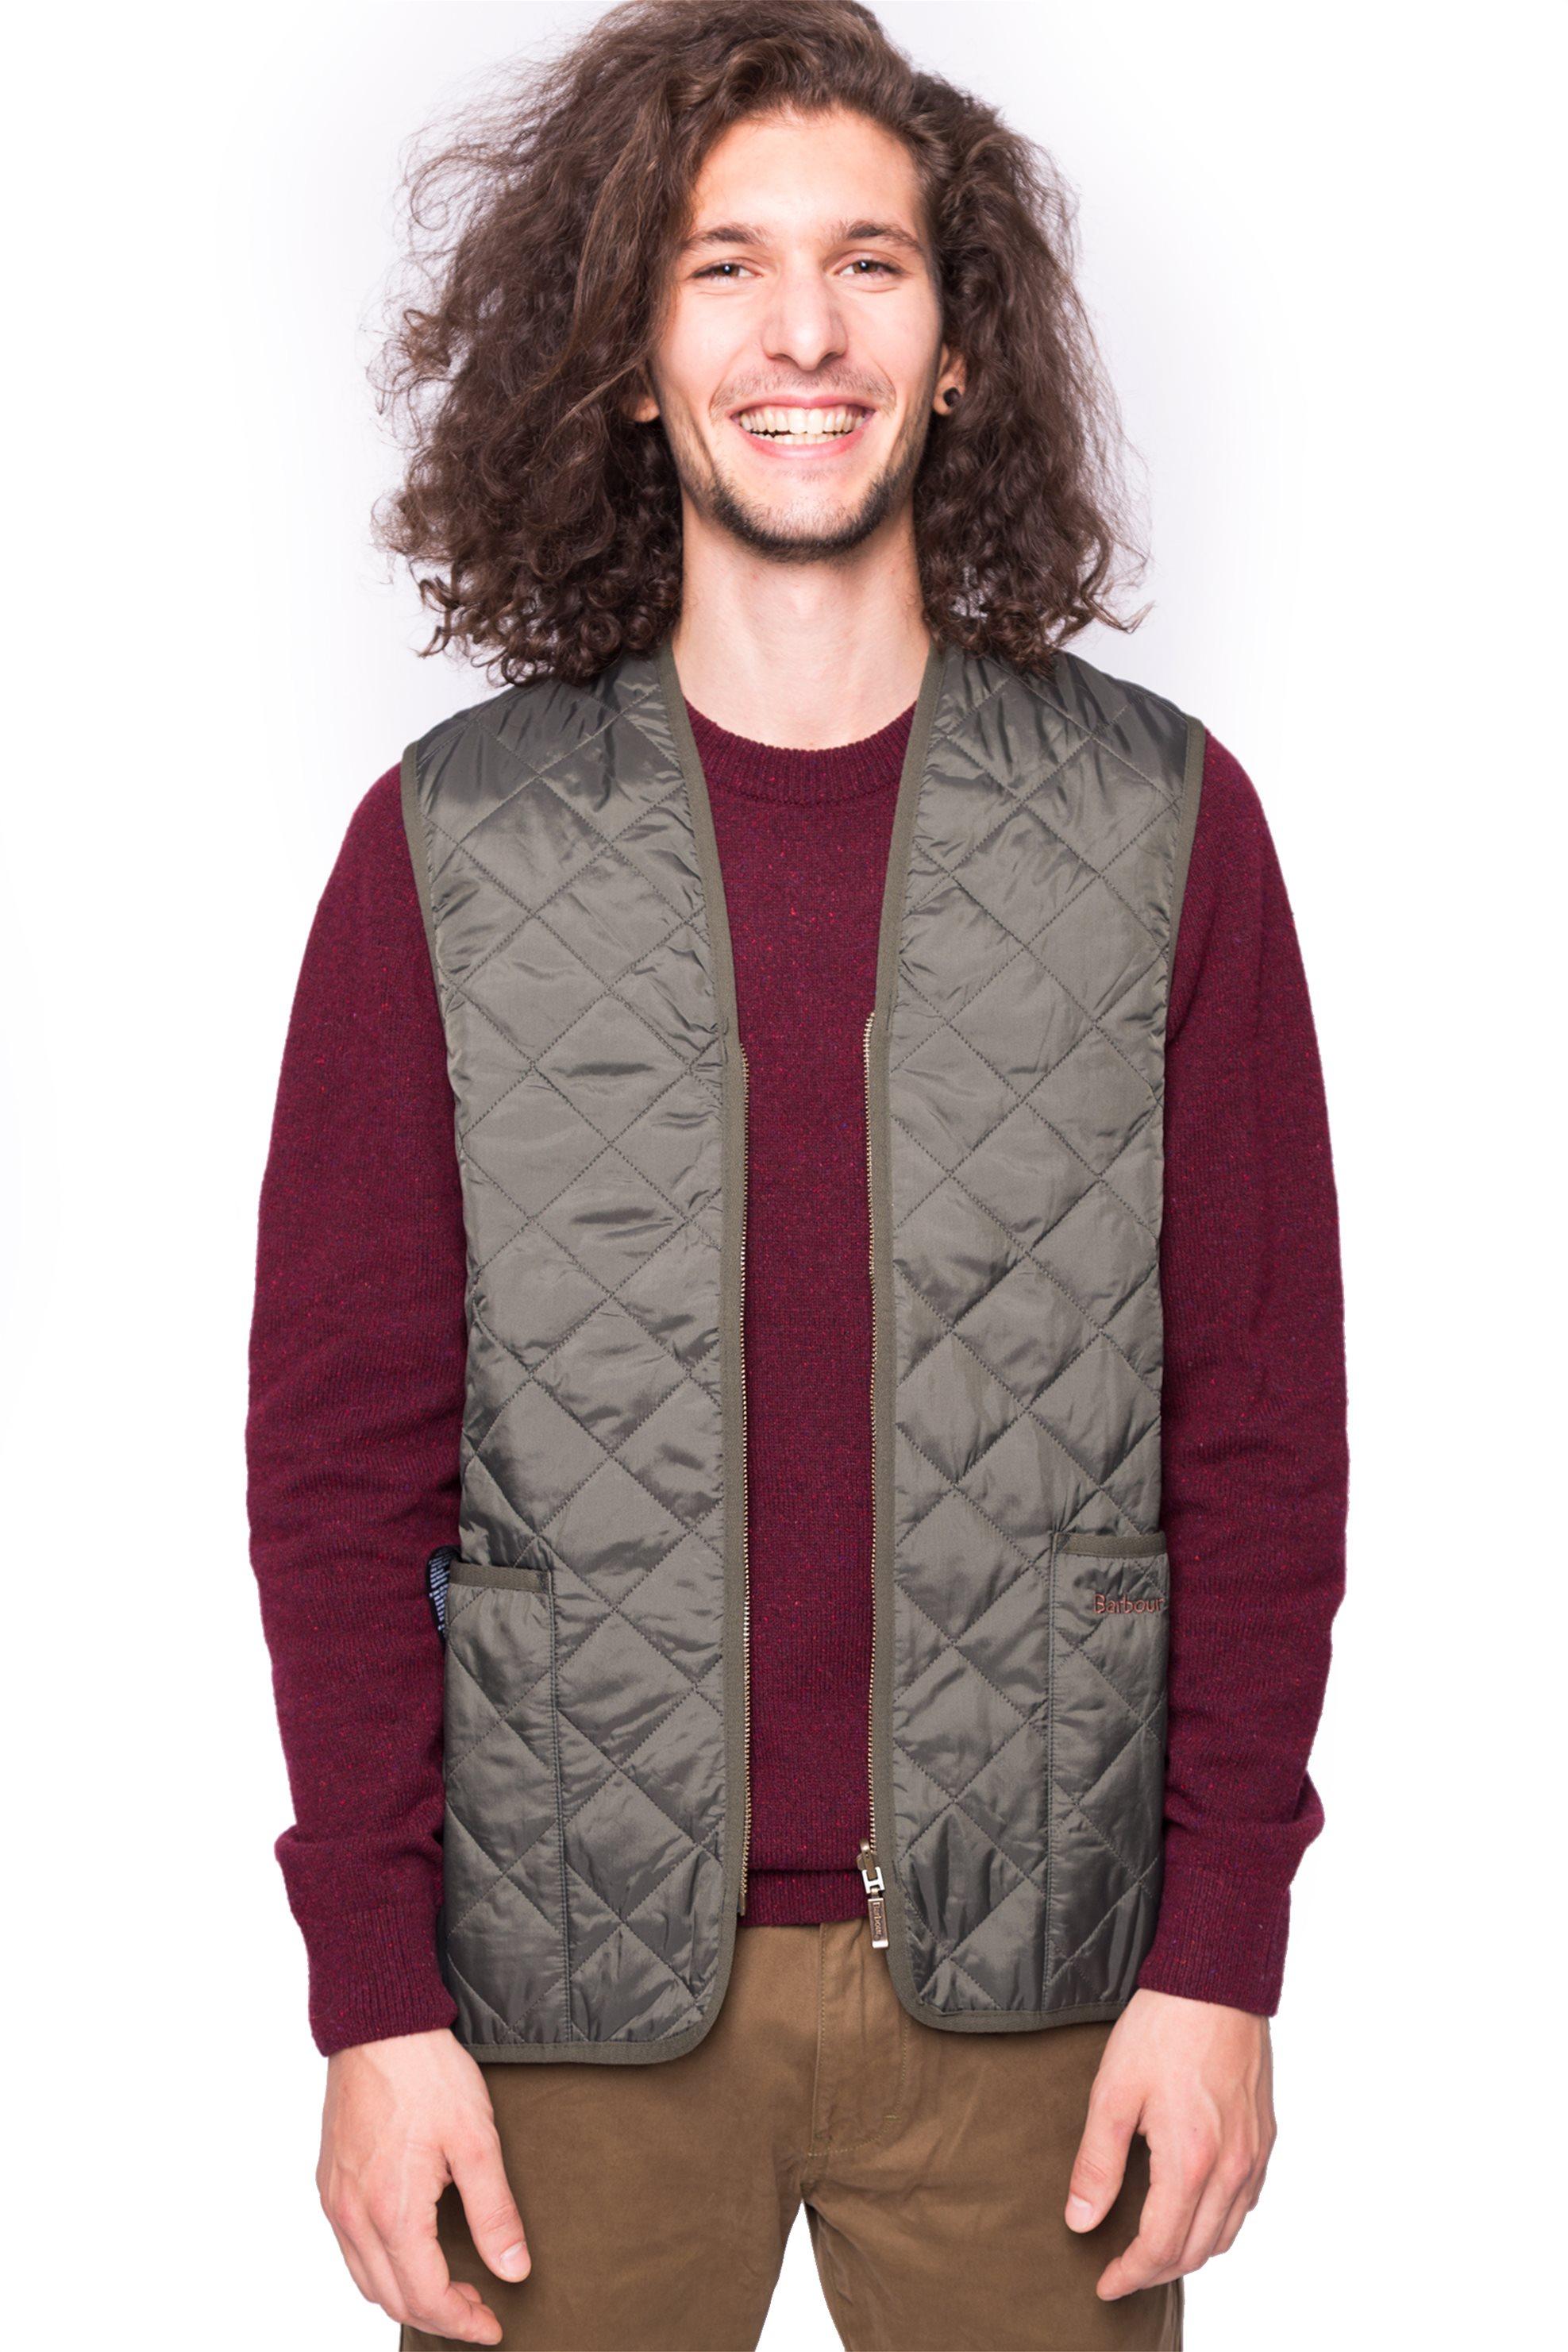 Barbour ανδρικό μπουφάν αμάνικο - MLI0001 - Λαδί ανδρασ   ρουχα   παλτό   μπουφάν   αμάνικα